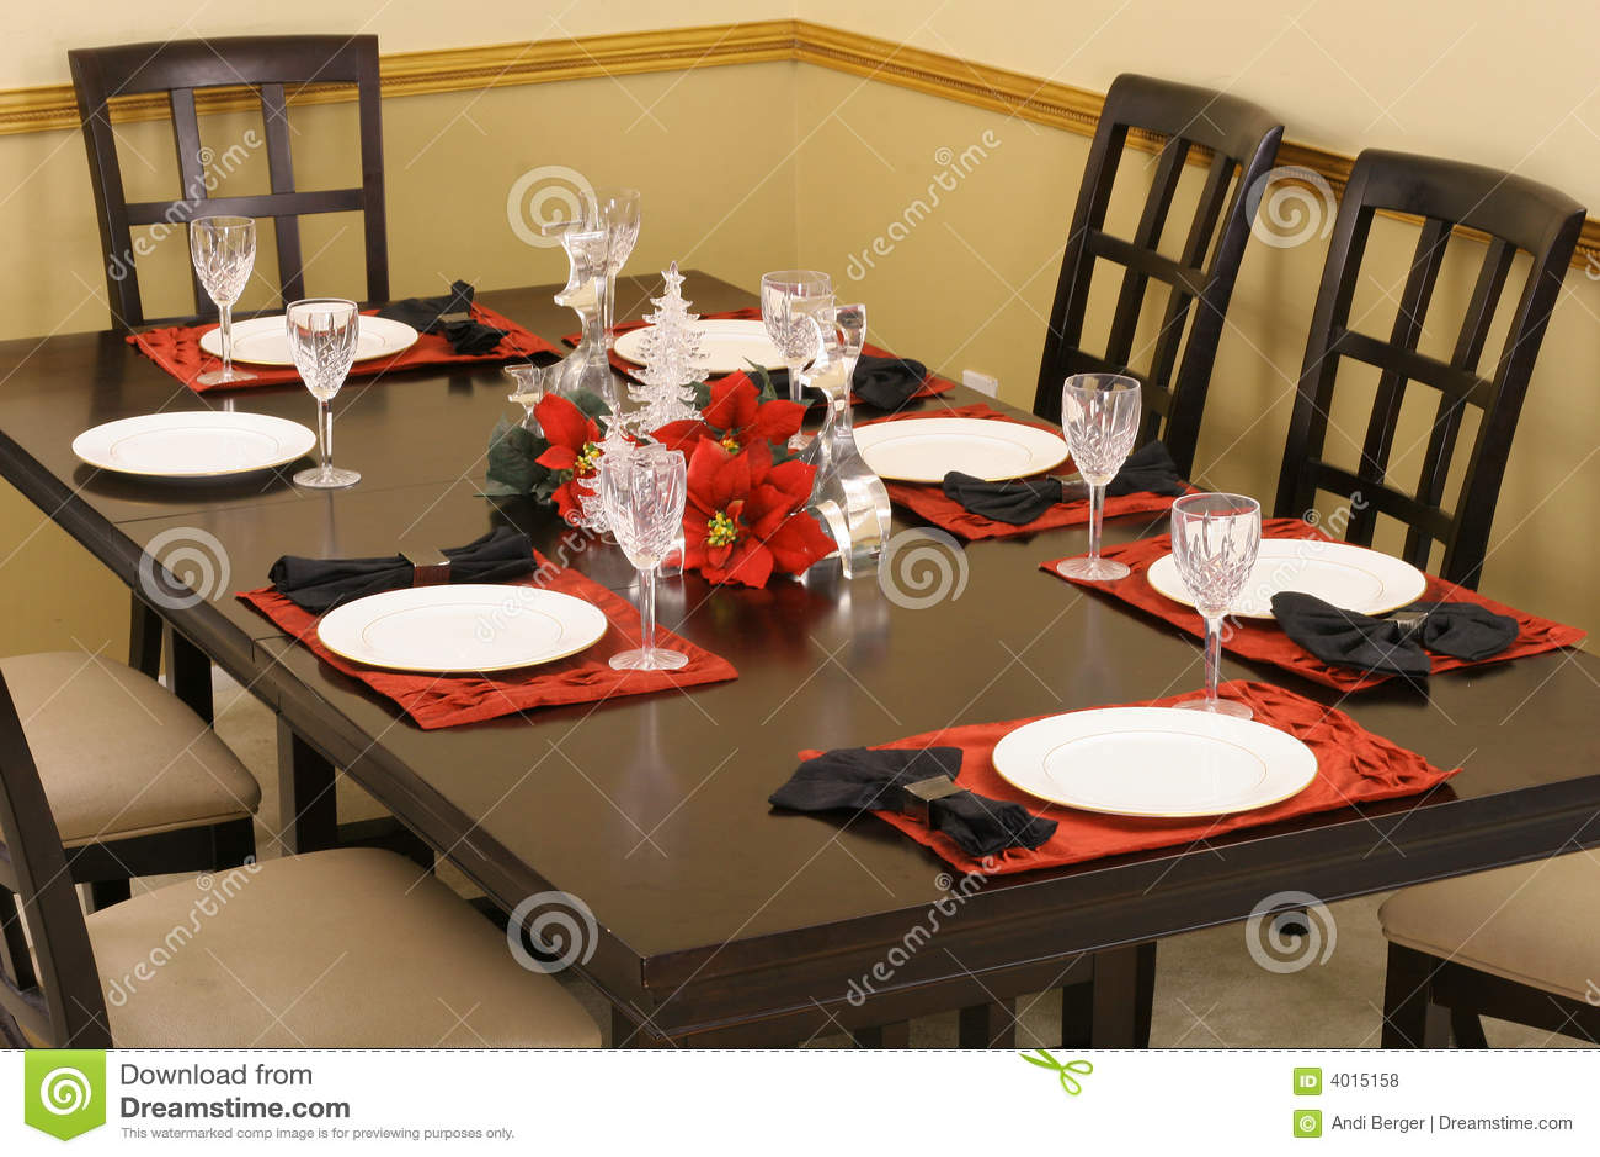 Dining room settings